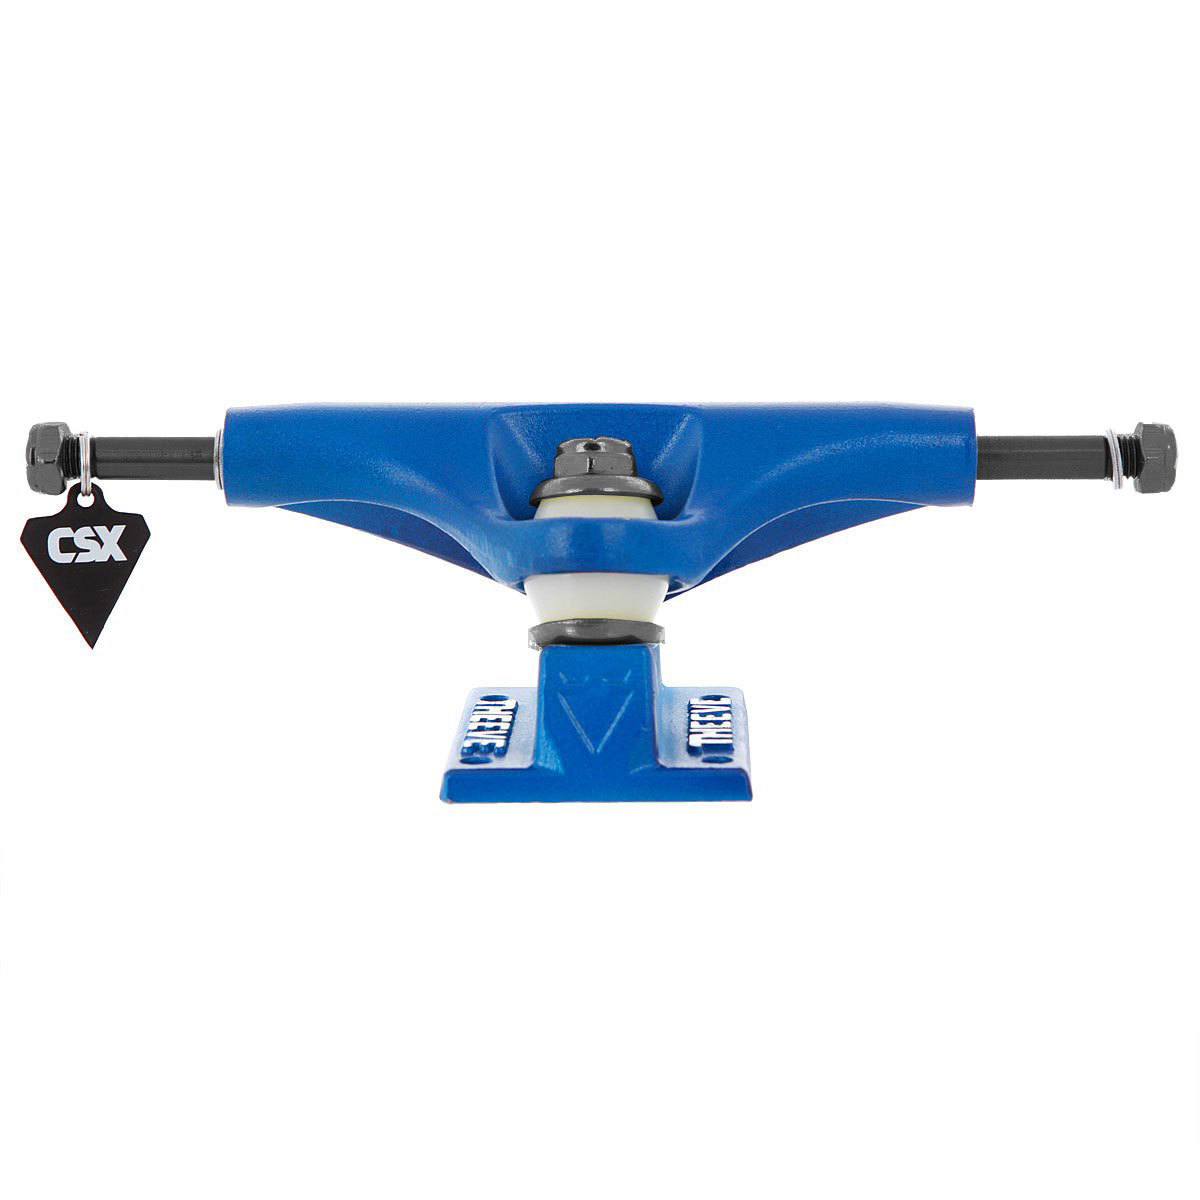 Подвески для скейта THEEVE CSX v3 (Blue/Black)